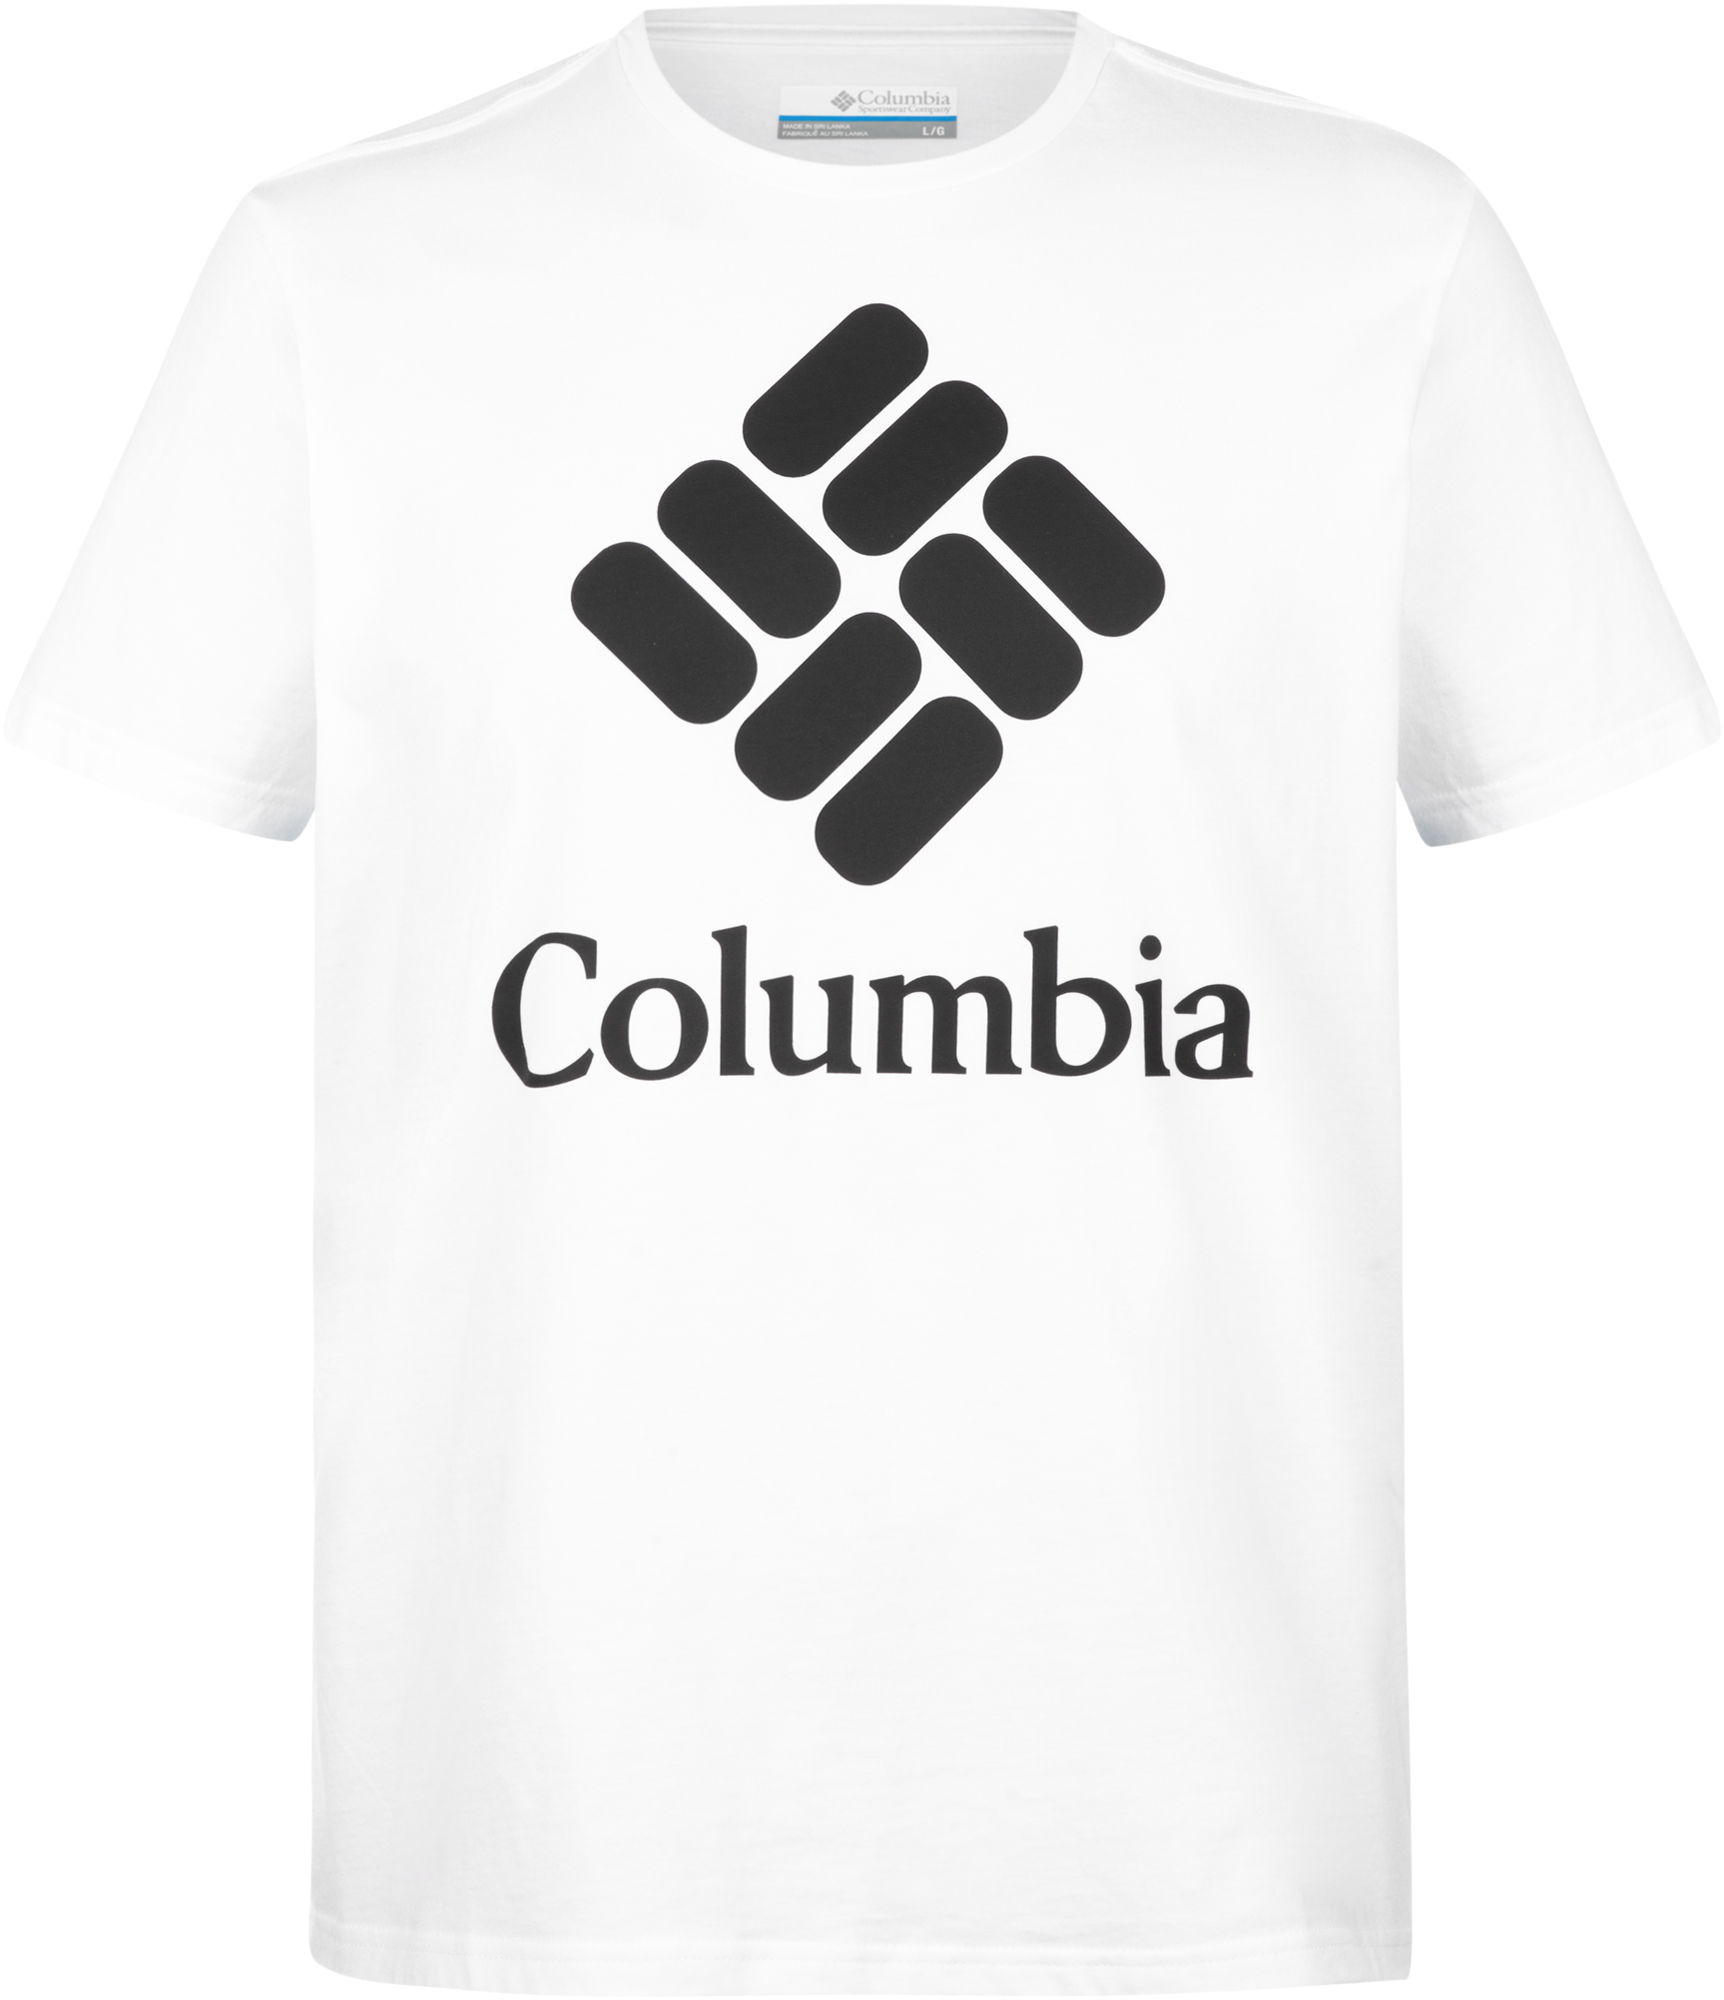 Columbia Футболка мужская Columbia Warren Grove Tee, размер 56 men ombre tee with drawstring shorts